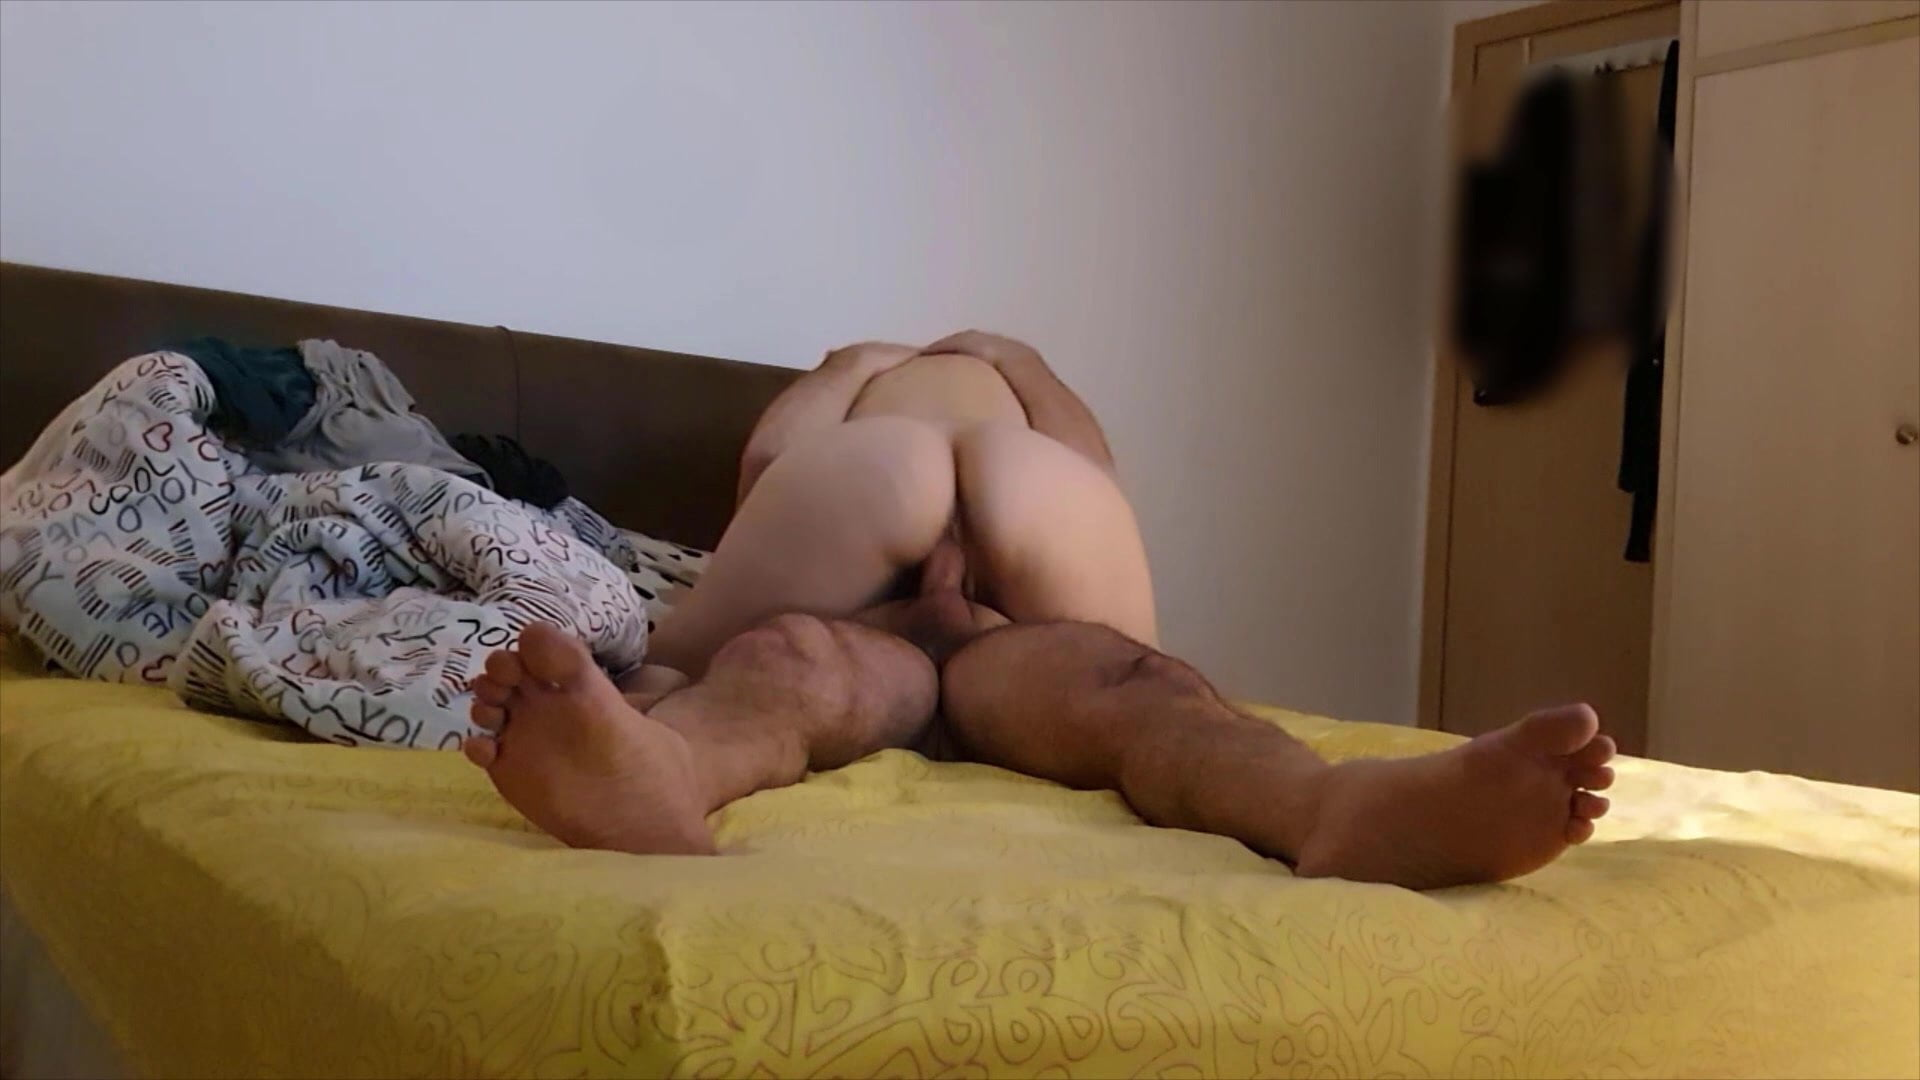 Wife Riding Free Milf Hd Porn Video F6 - Xhamster Fr-3690